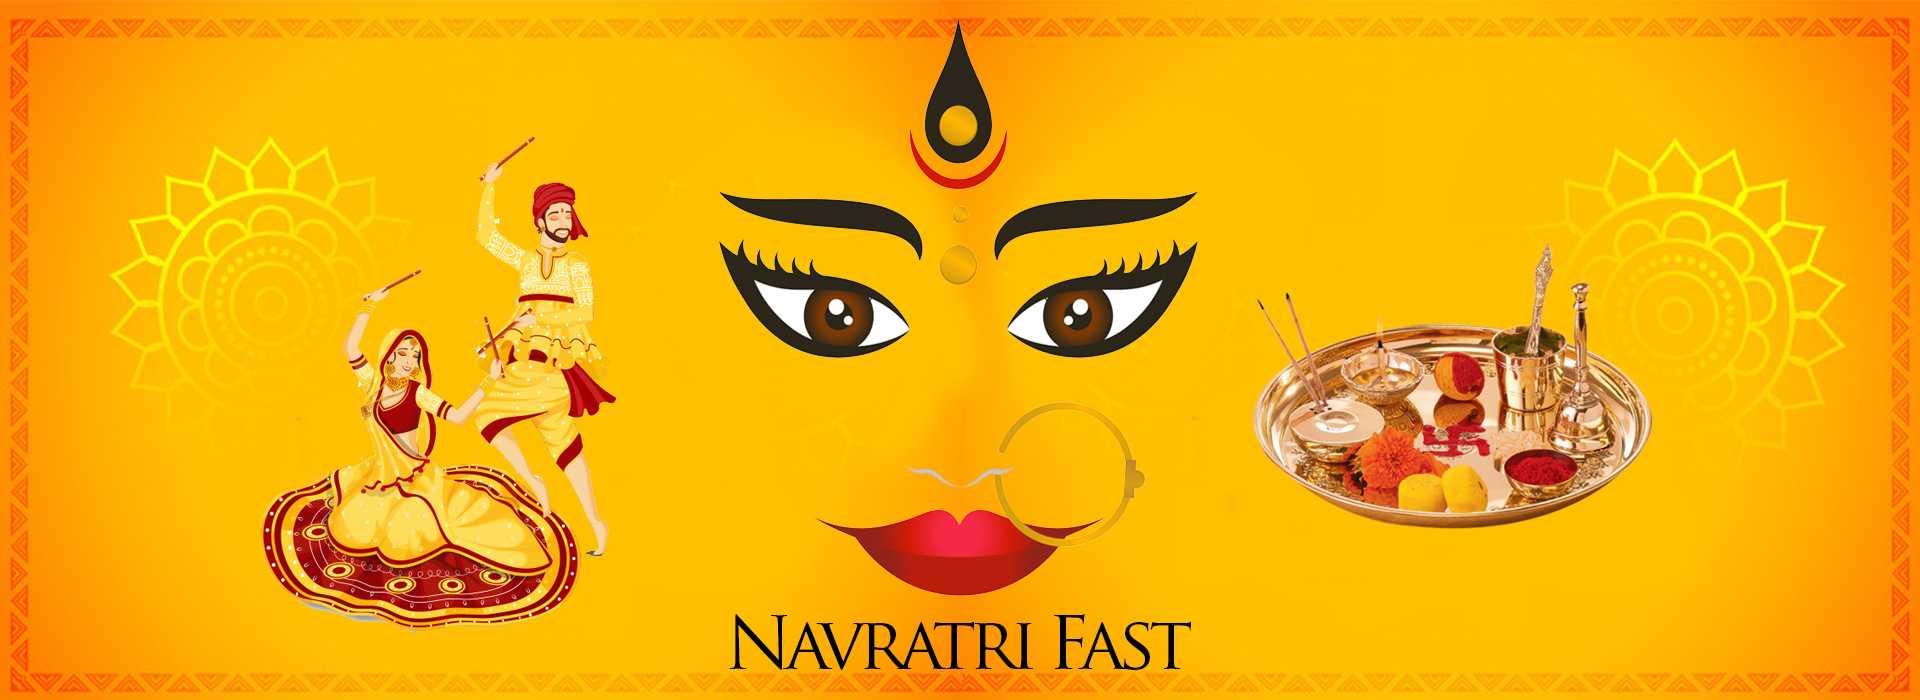 Navratri fasting benefits